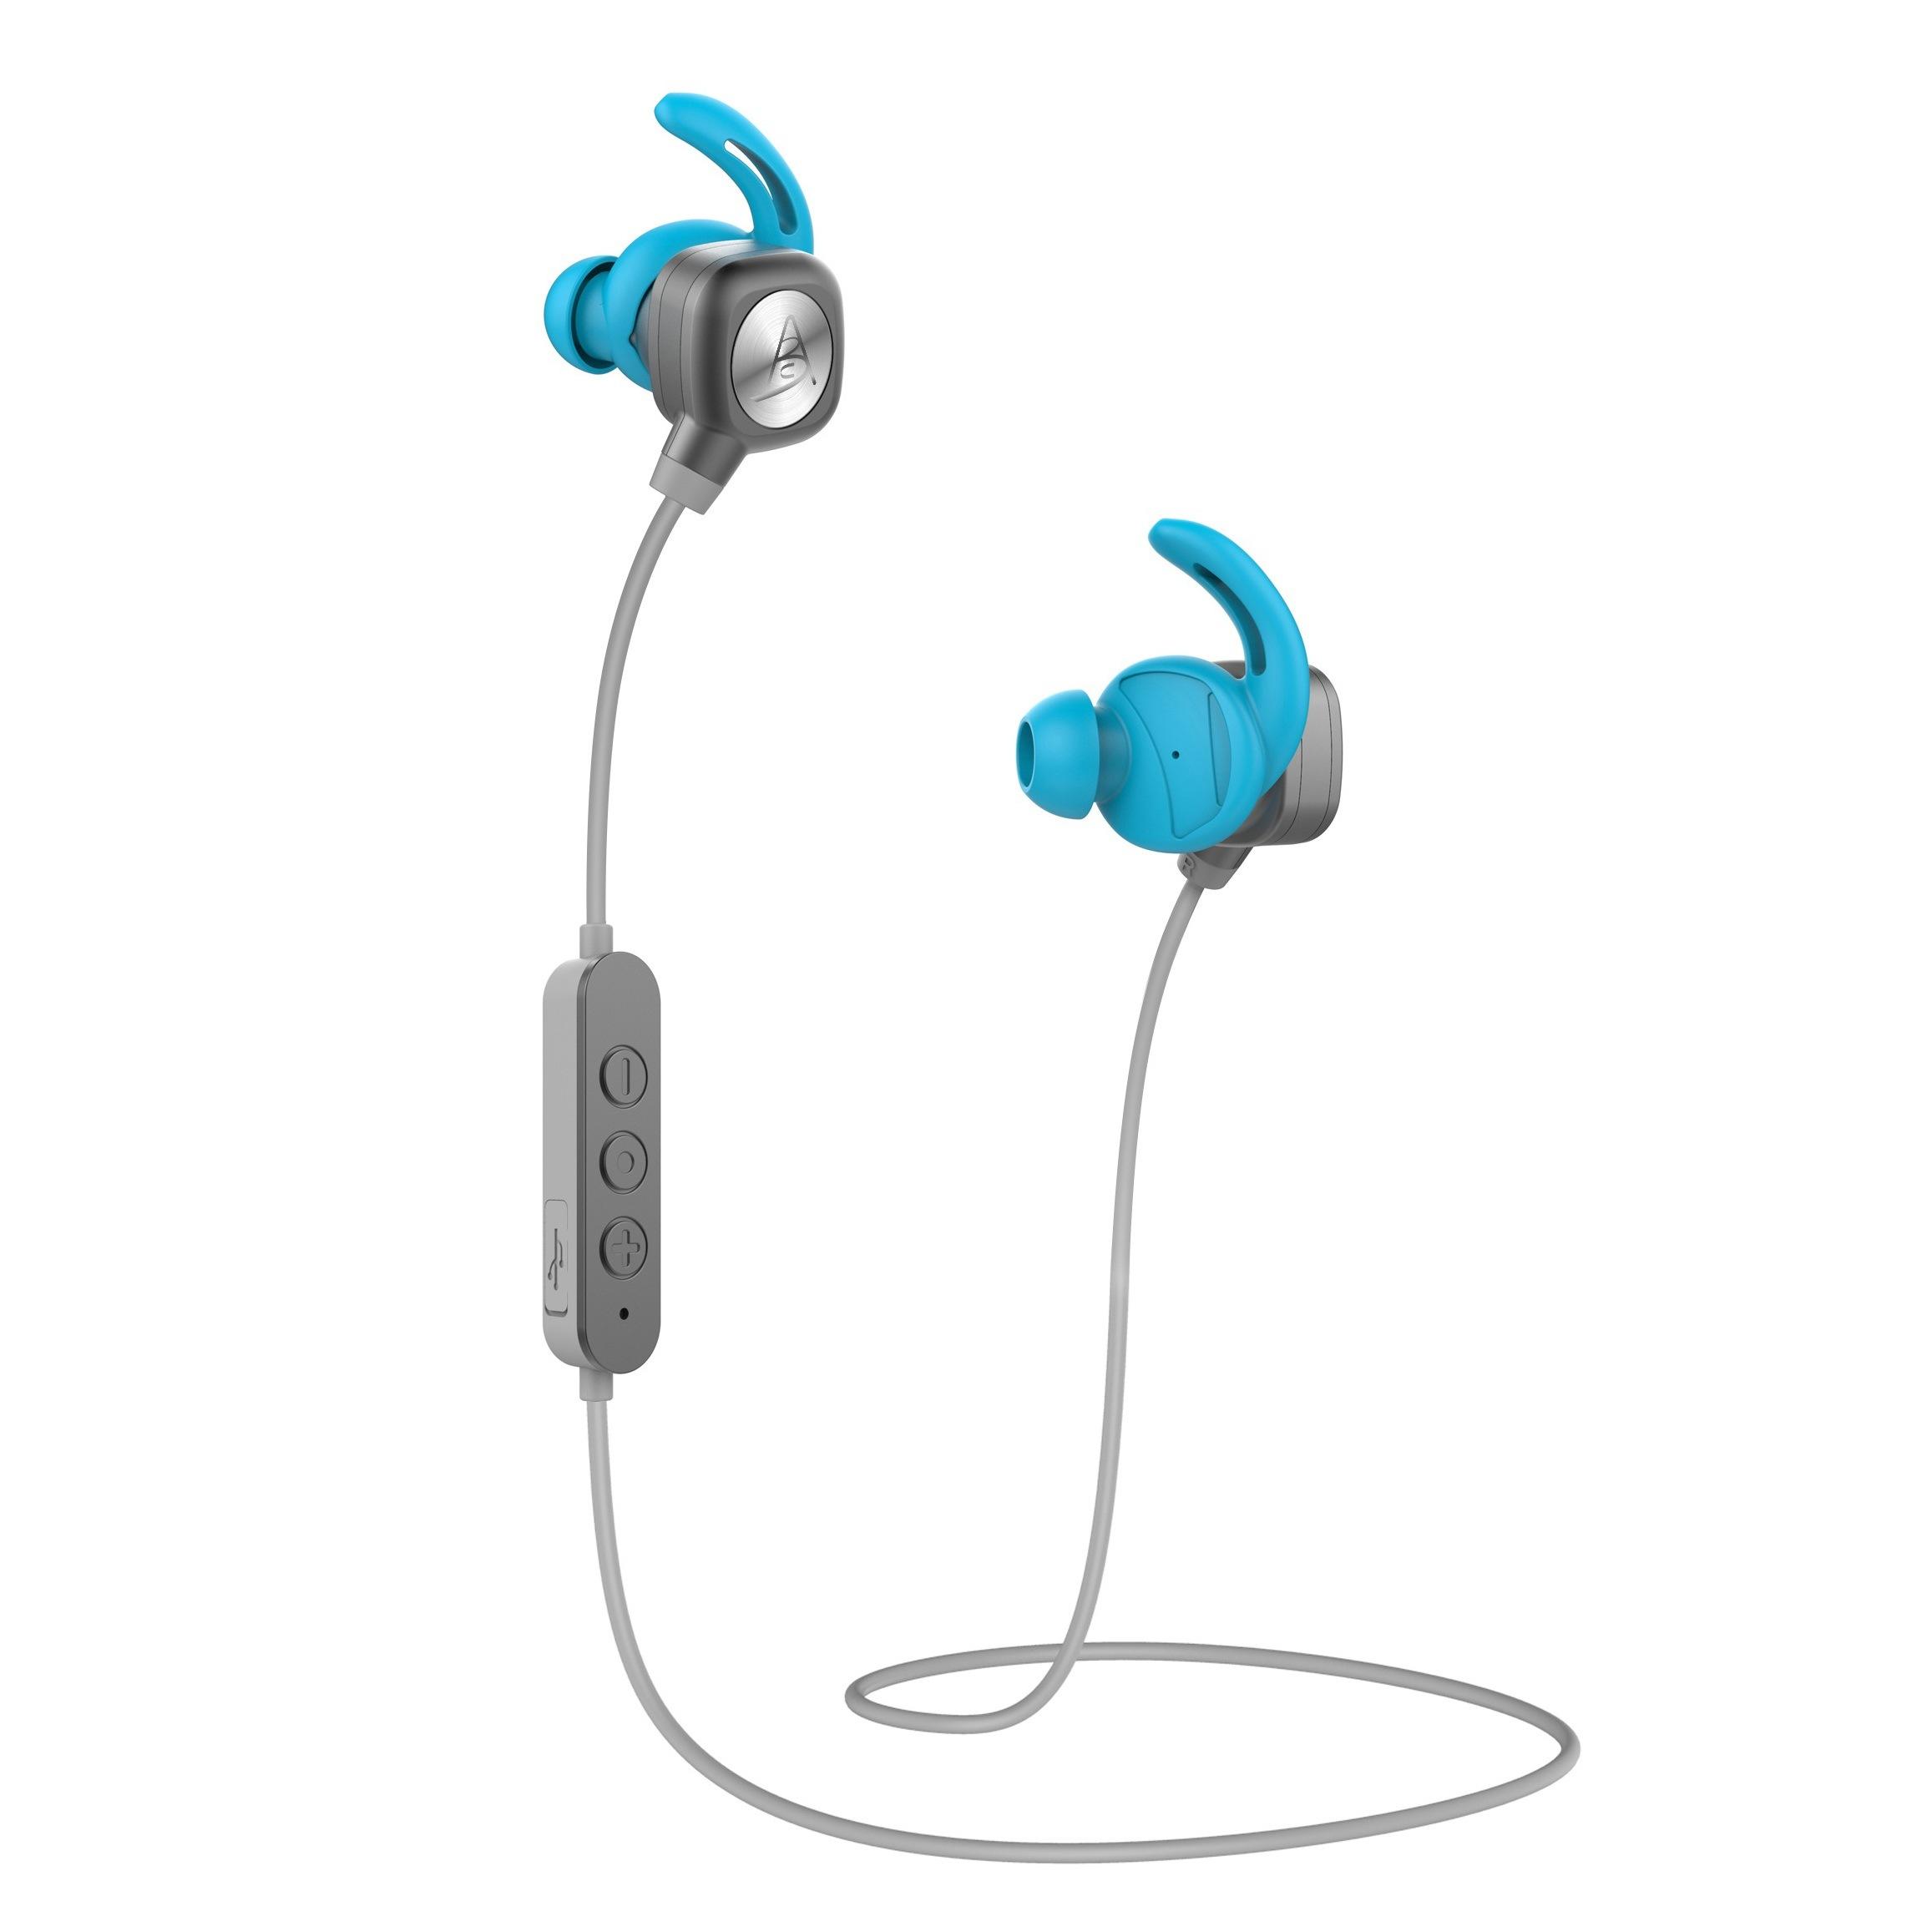 Bluetooth Headphones Magnetic Wireless Earbuds Sport in-Ear Sweatproof Earphones